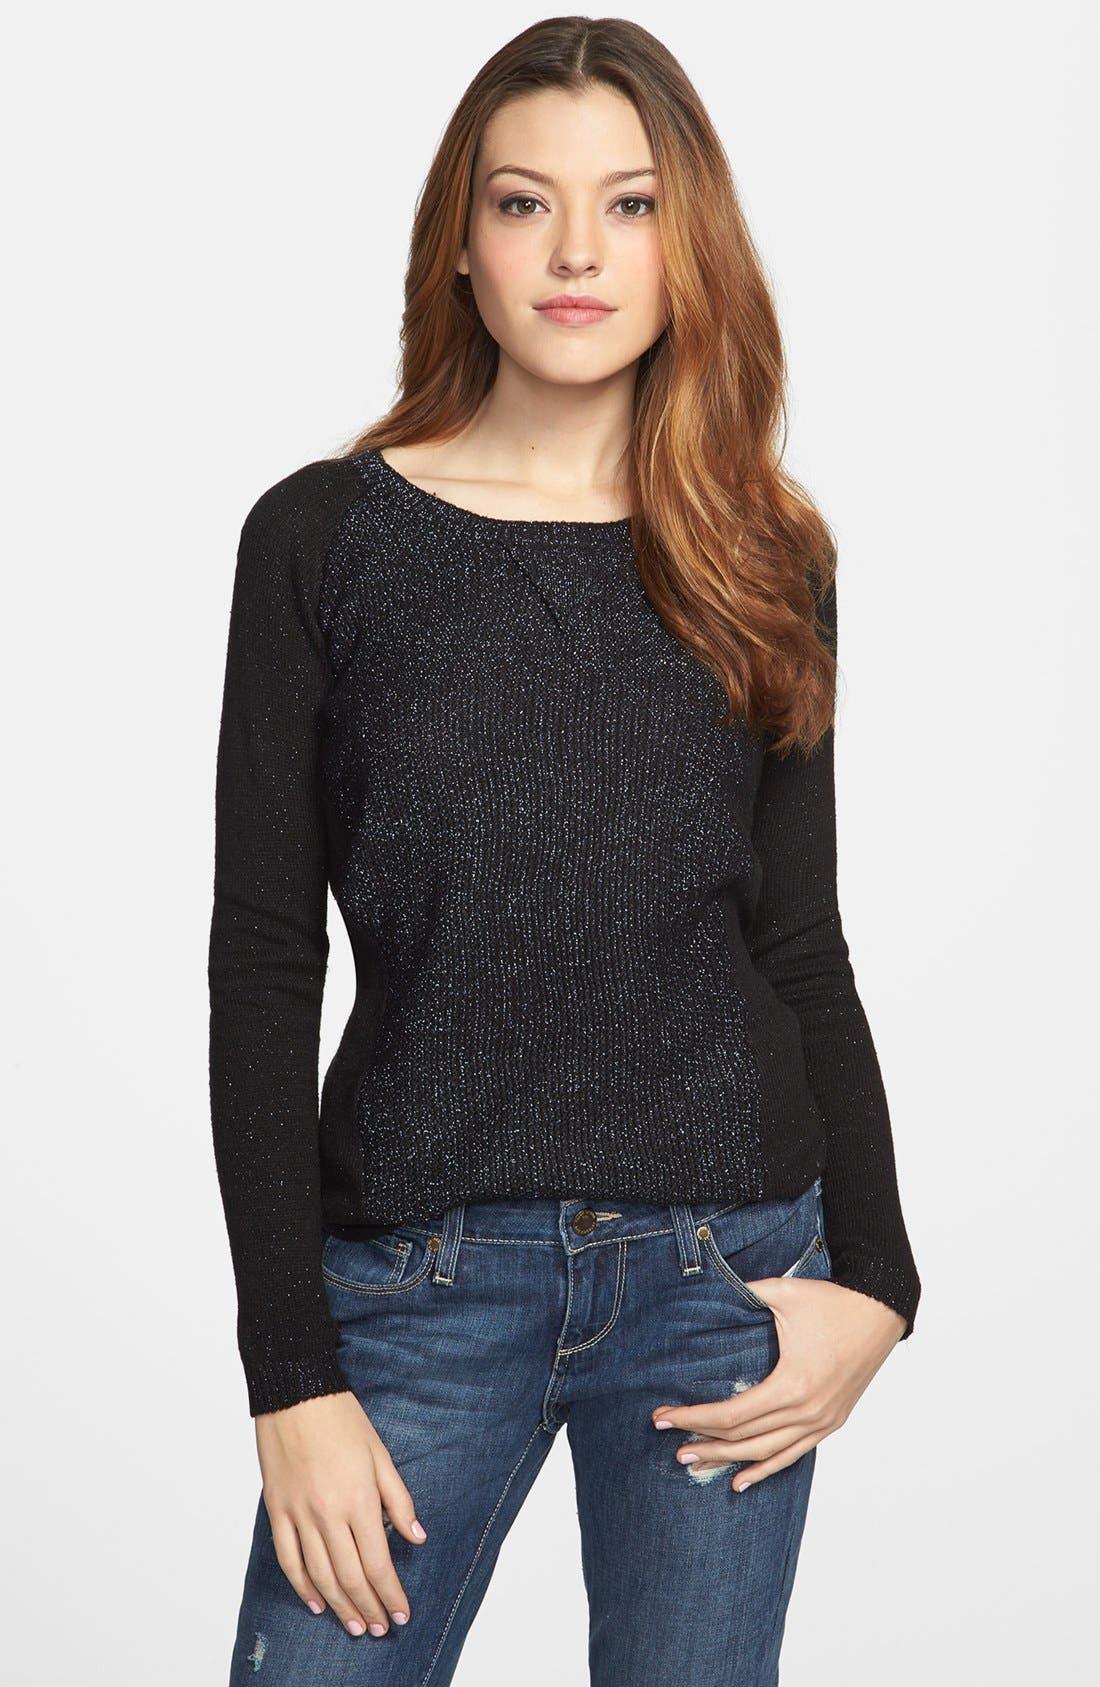 Alternate Image 1 Selected - Dex Colorblock Metallic Knit Tunic Sweater